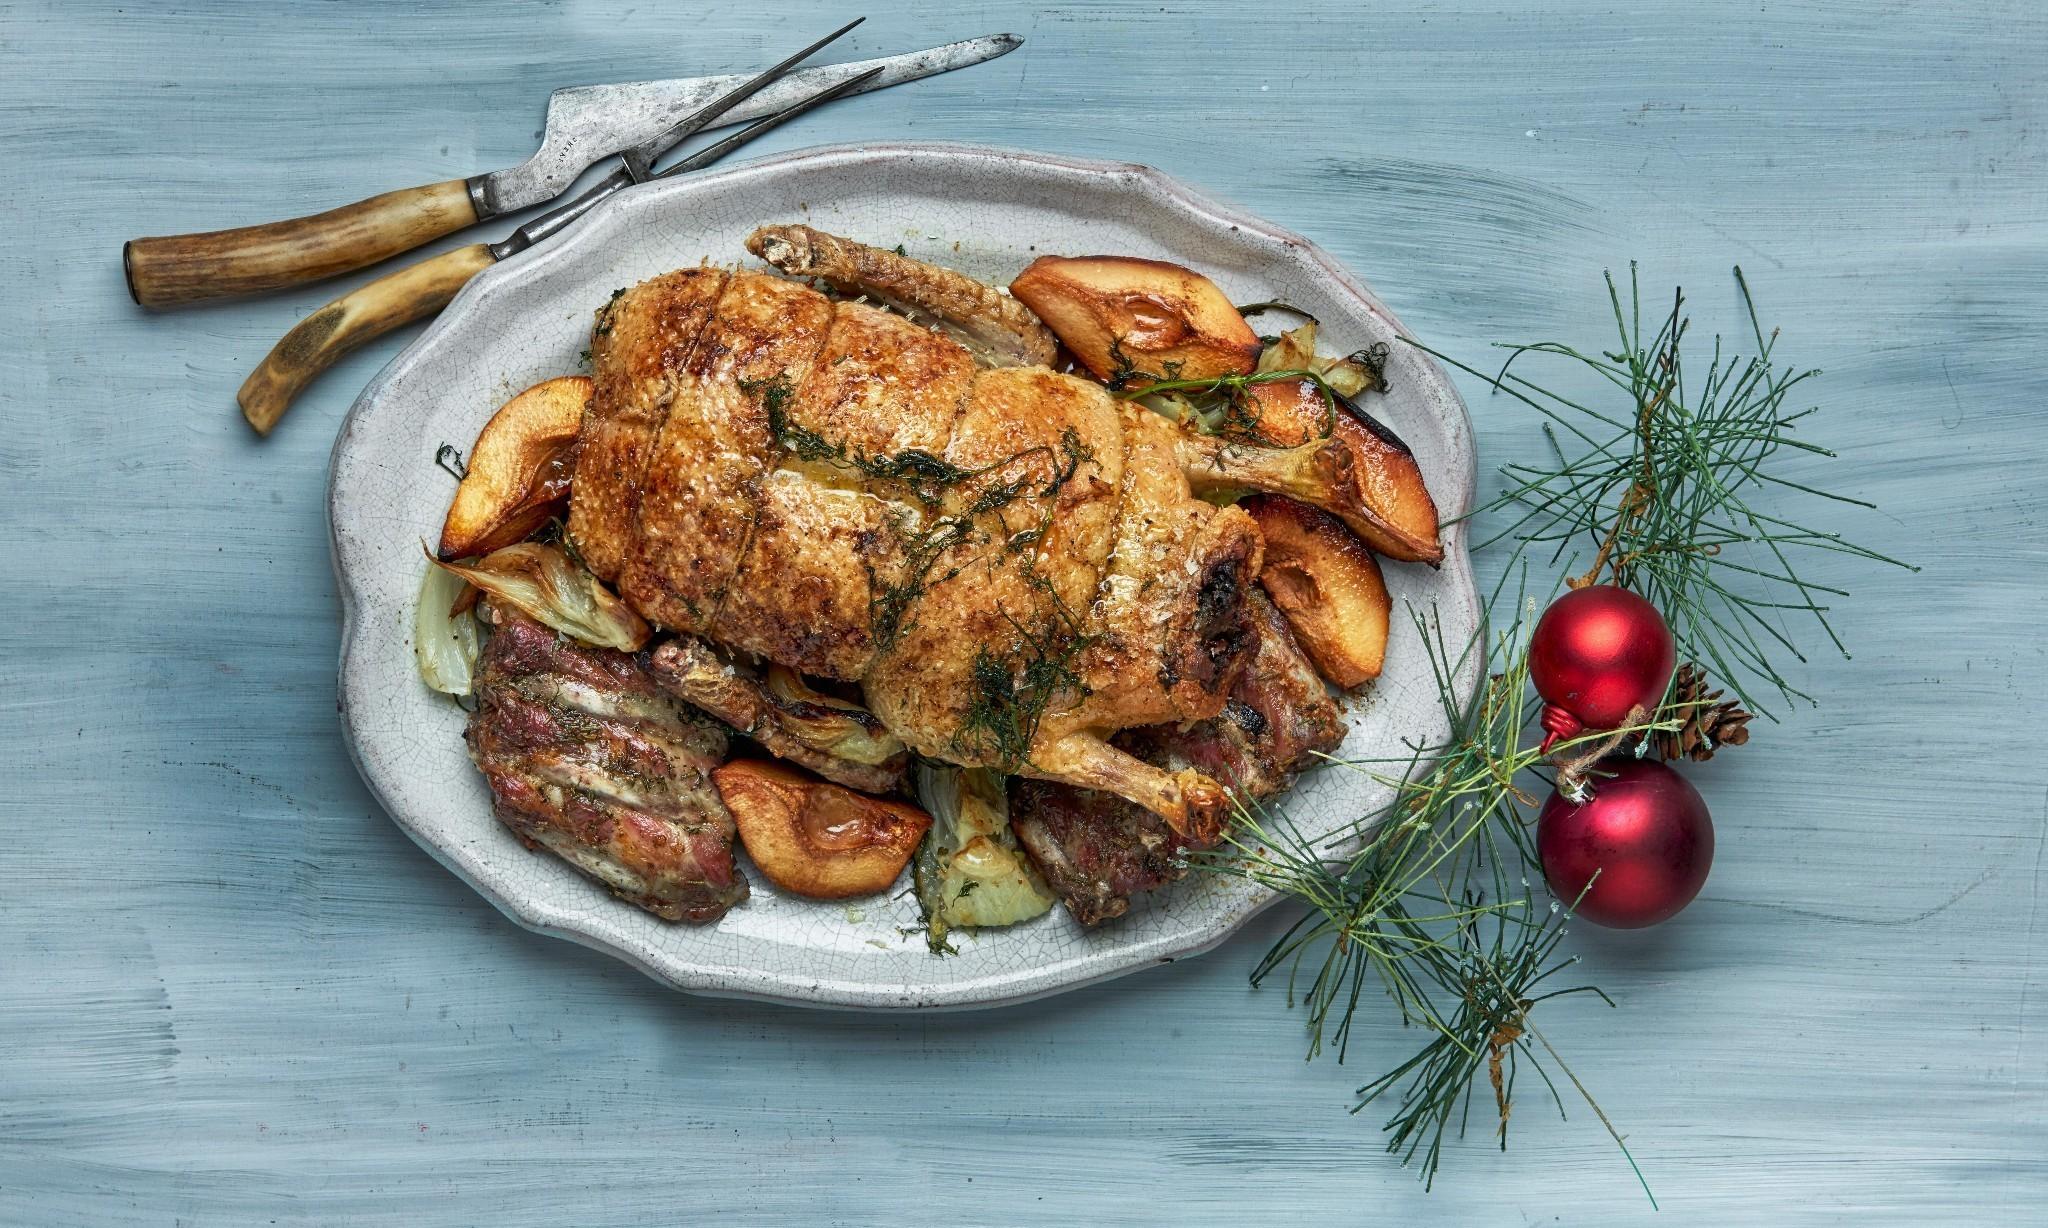 Joe Trivelli's Italian Christmas recipes